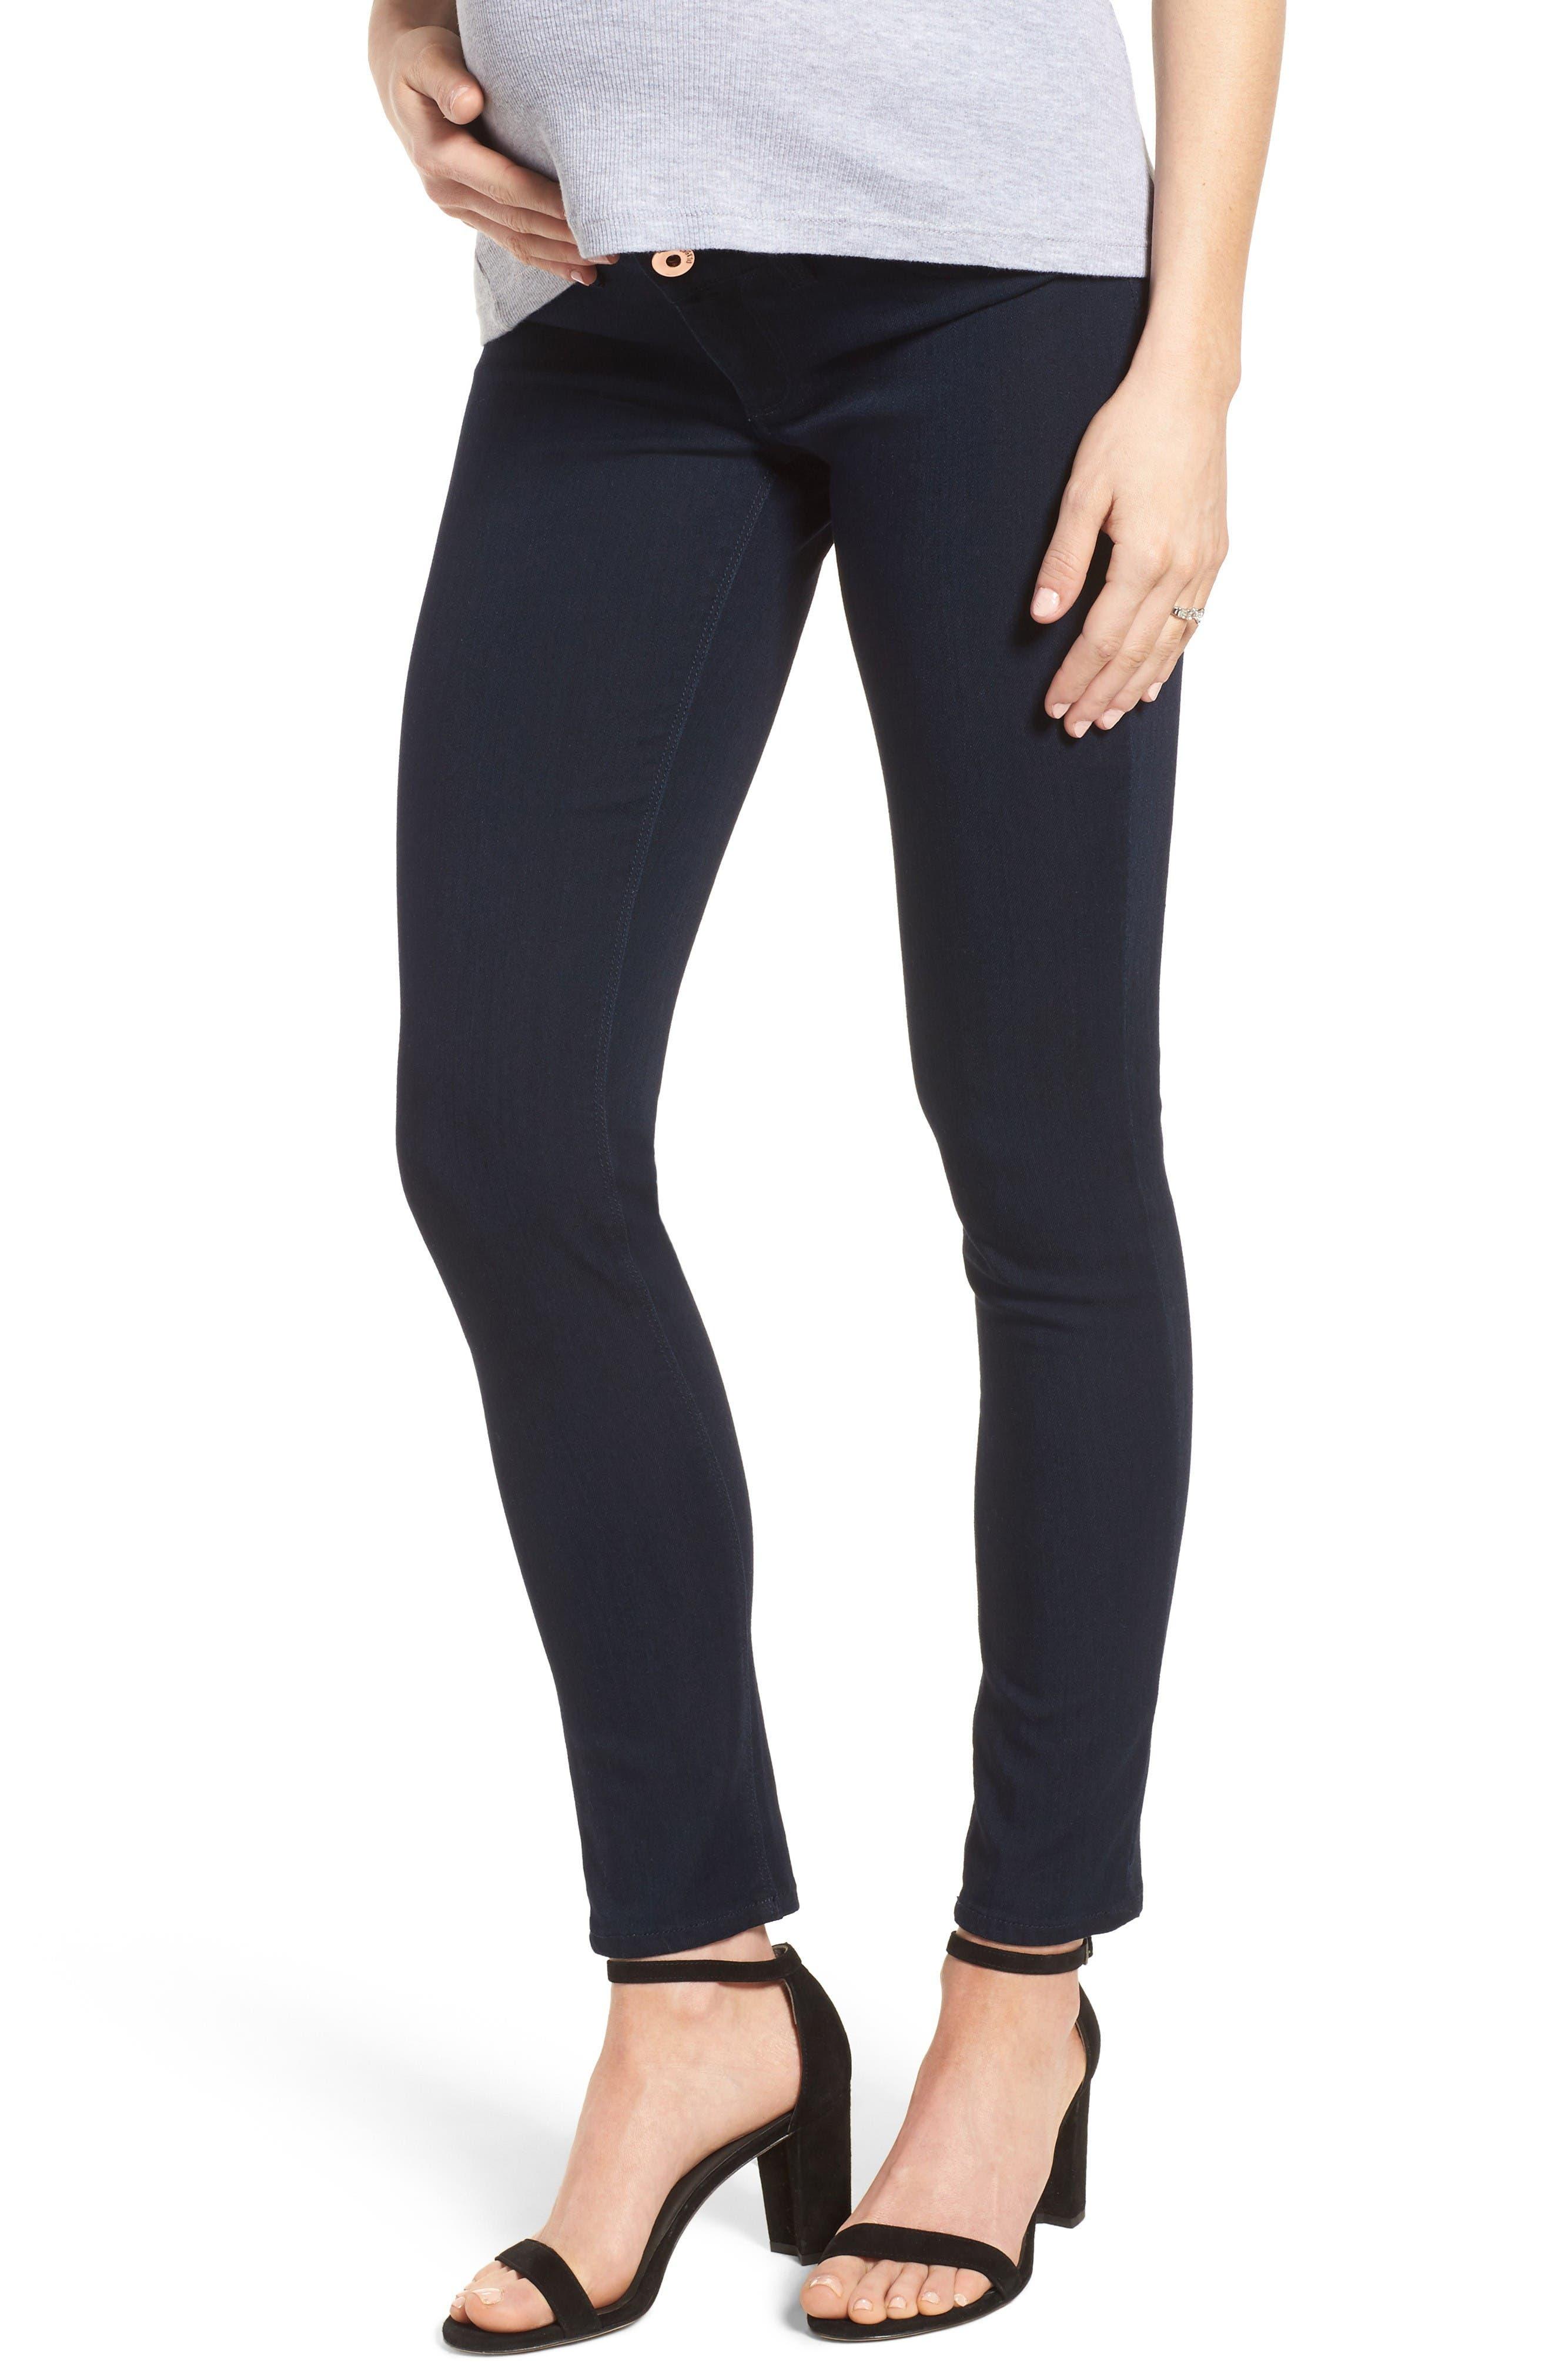 Main Image - DL1961 Emma Power Legging Maternity Jeans (Flatiron)